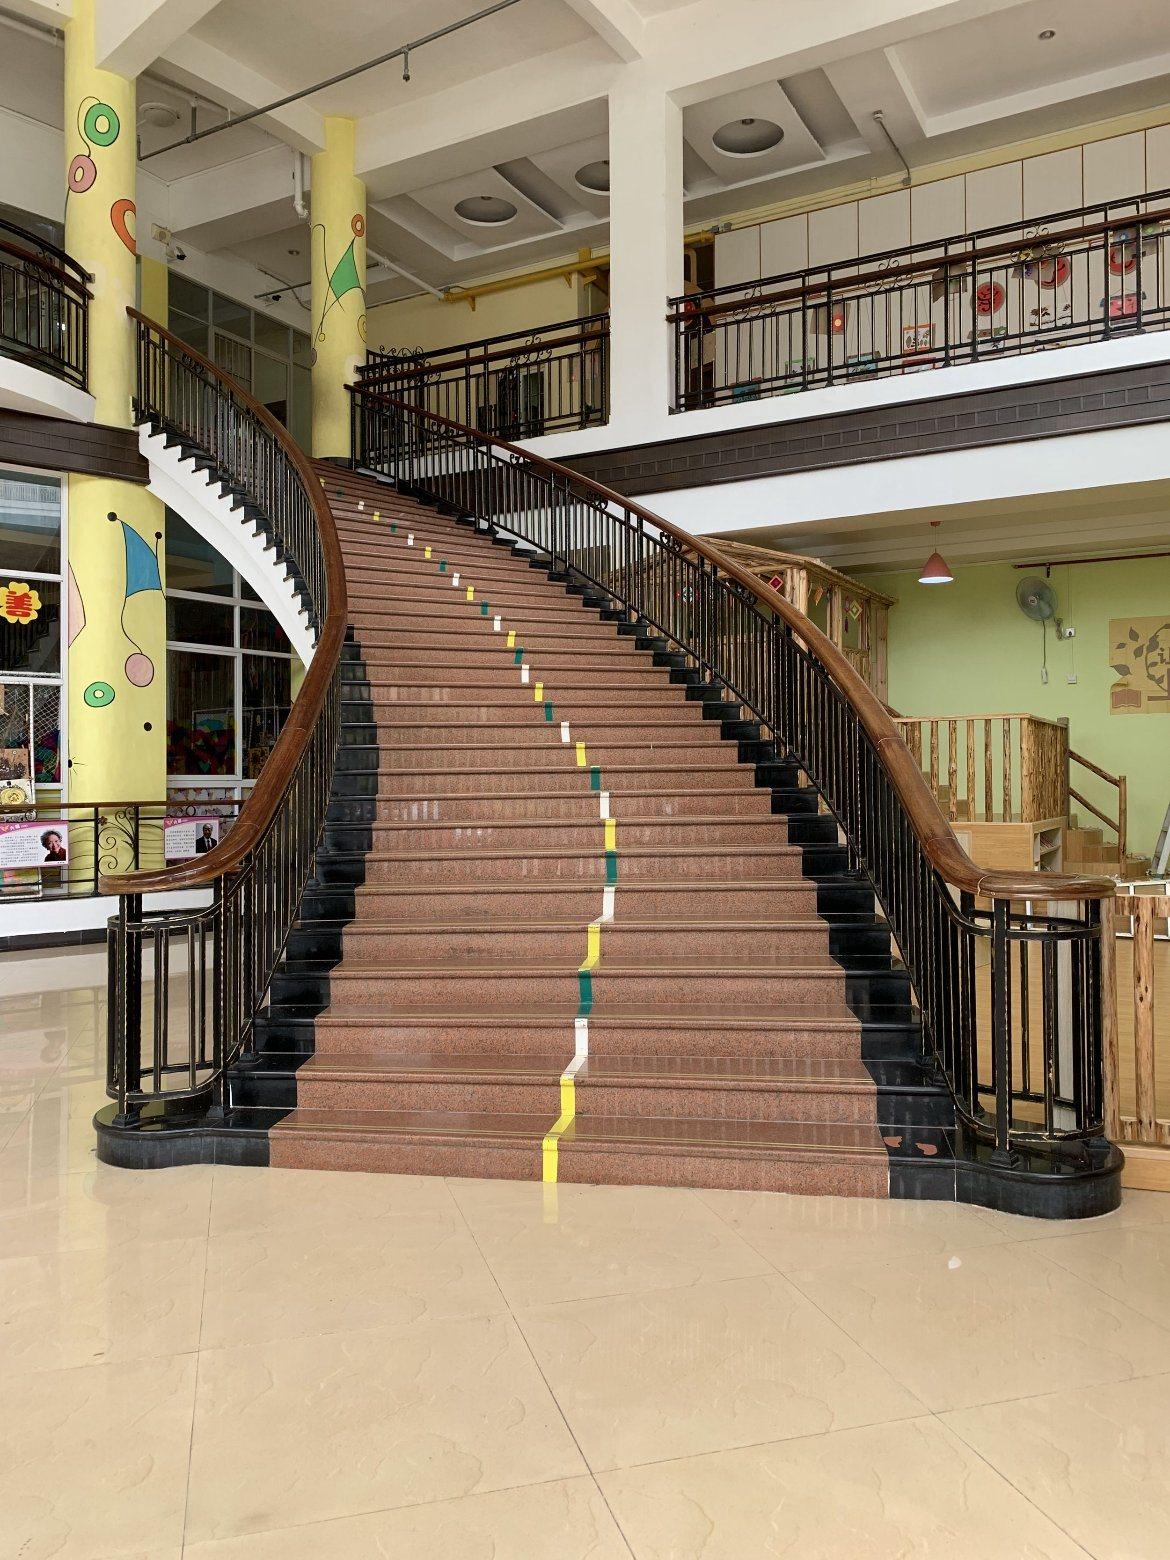 China Customized Luxury Indoor Wrought Iron Stair Railing Design Interior Stair Railings China Stair Railing Stair Handrail